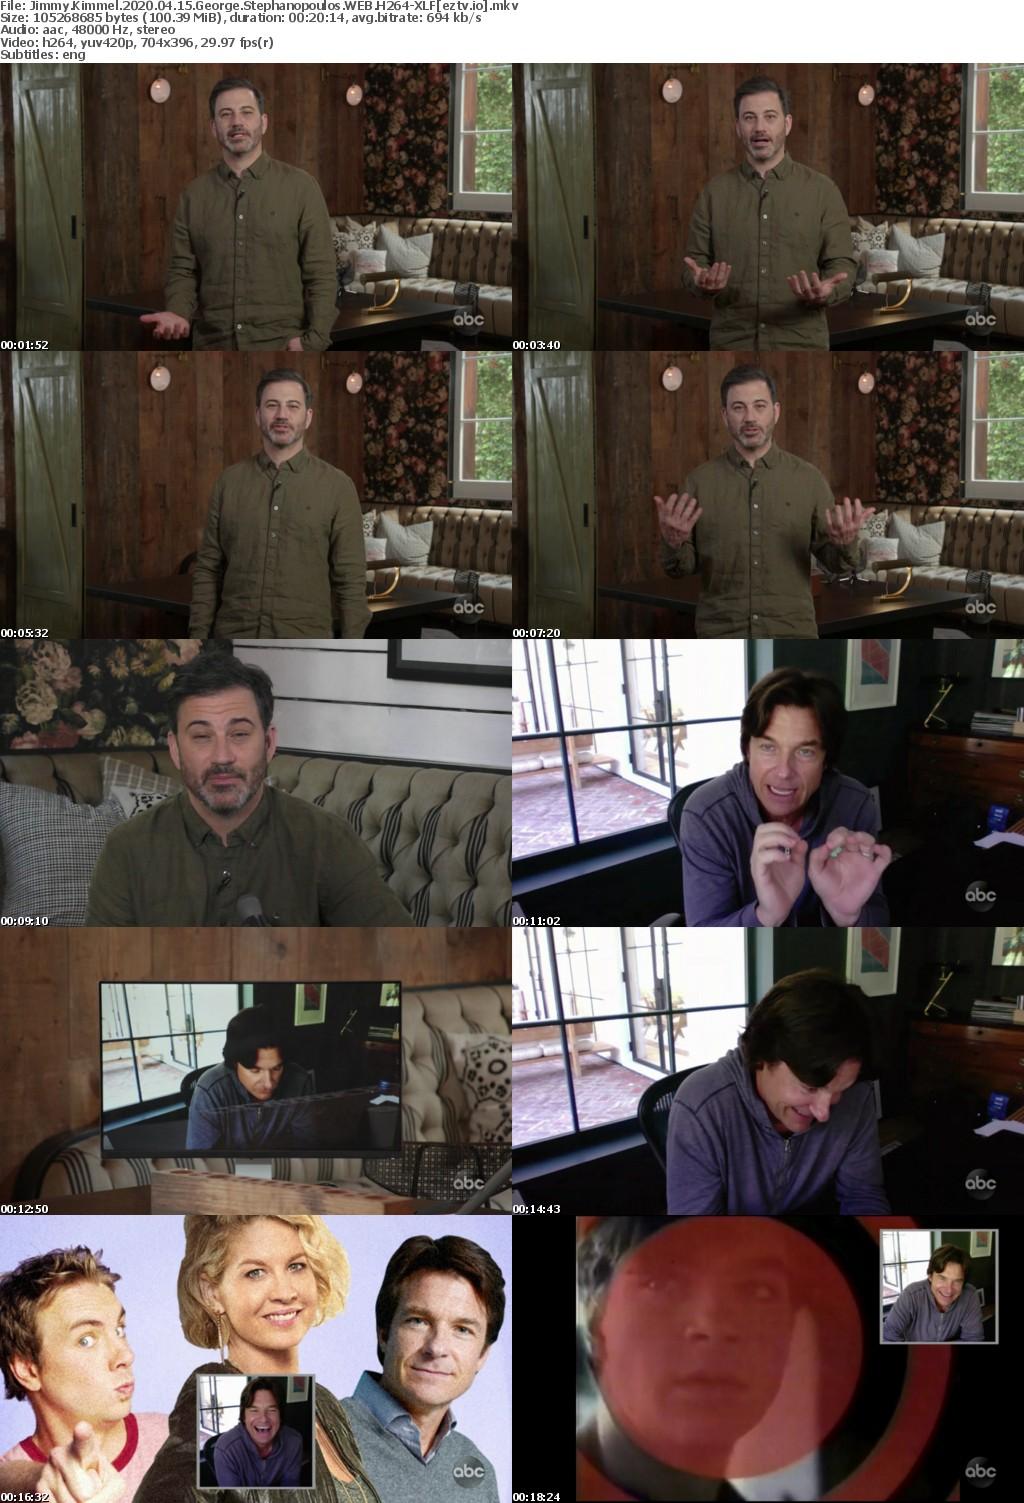 Jimmy Kimmel 2020 04 15 George Stephanopoulos WEB H264-XLF